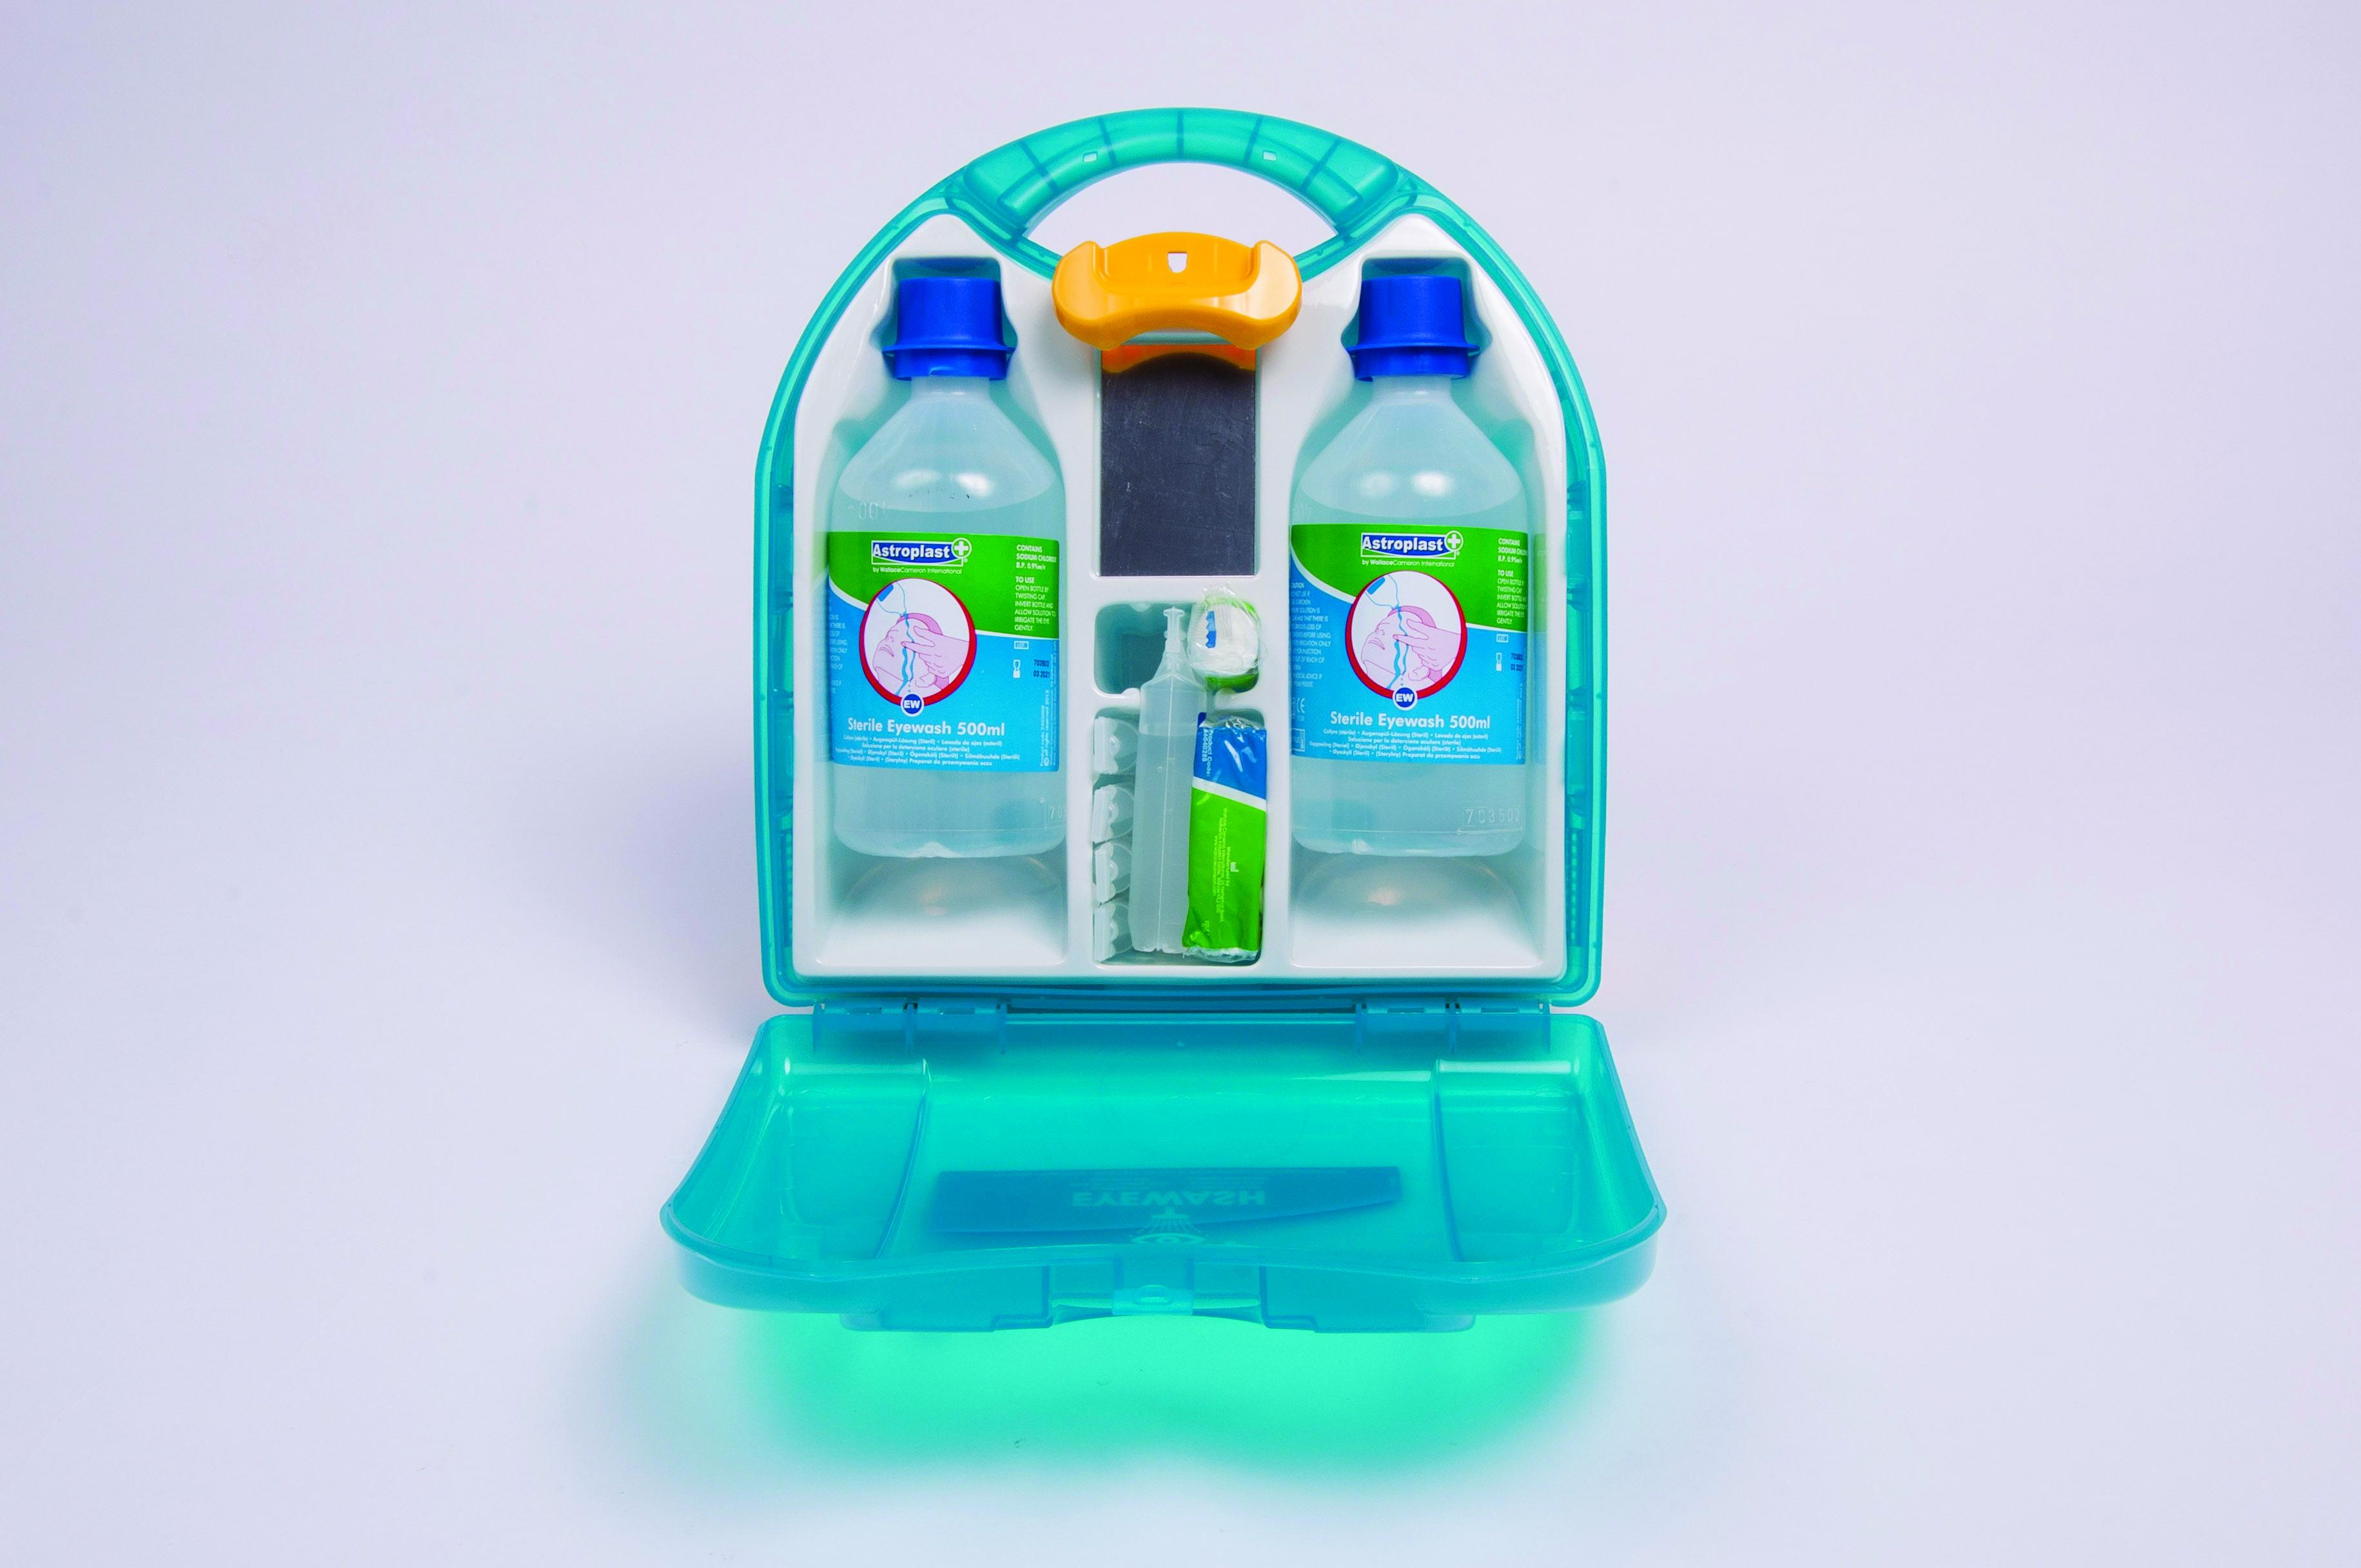 Immerse Supplies emergency eyewash kit contents